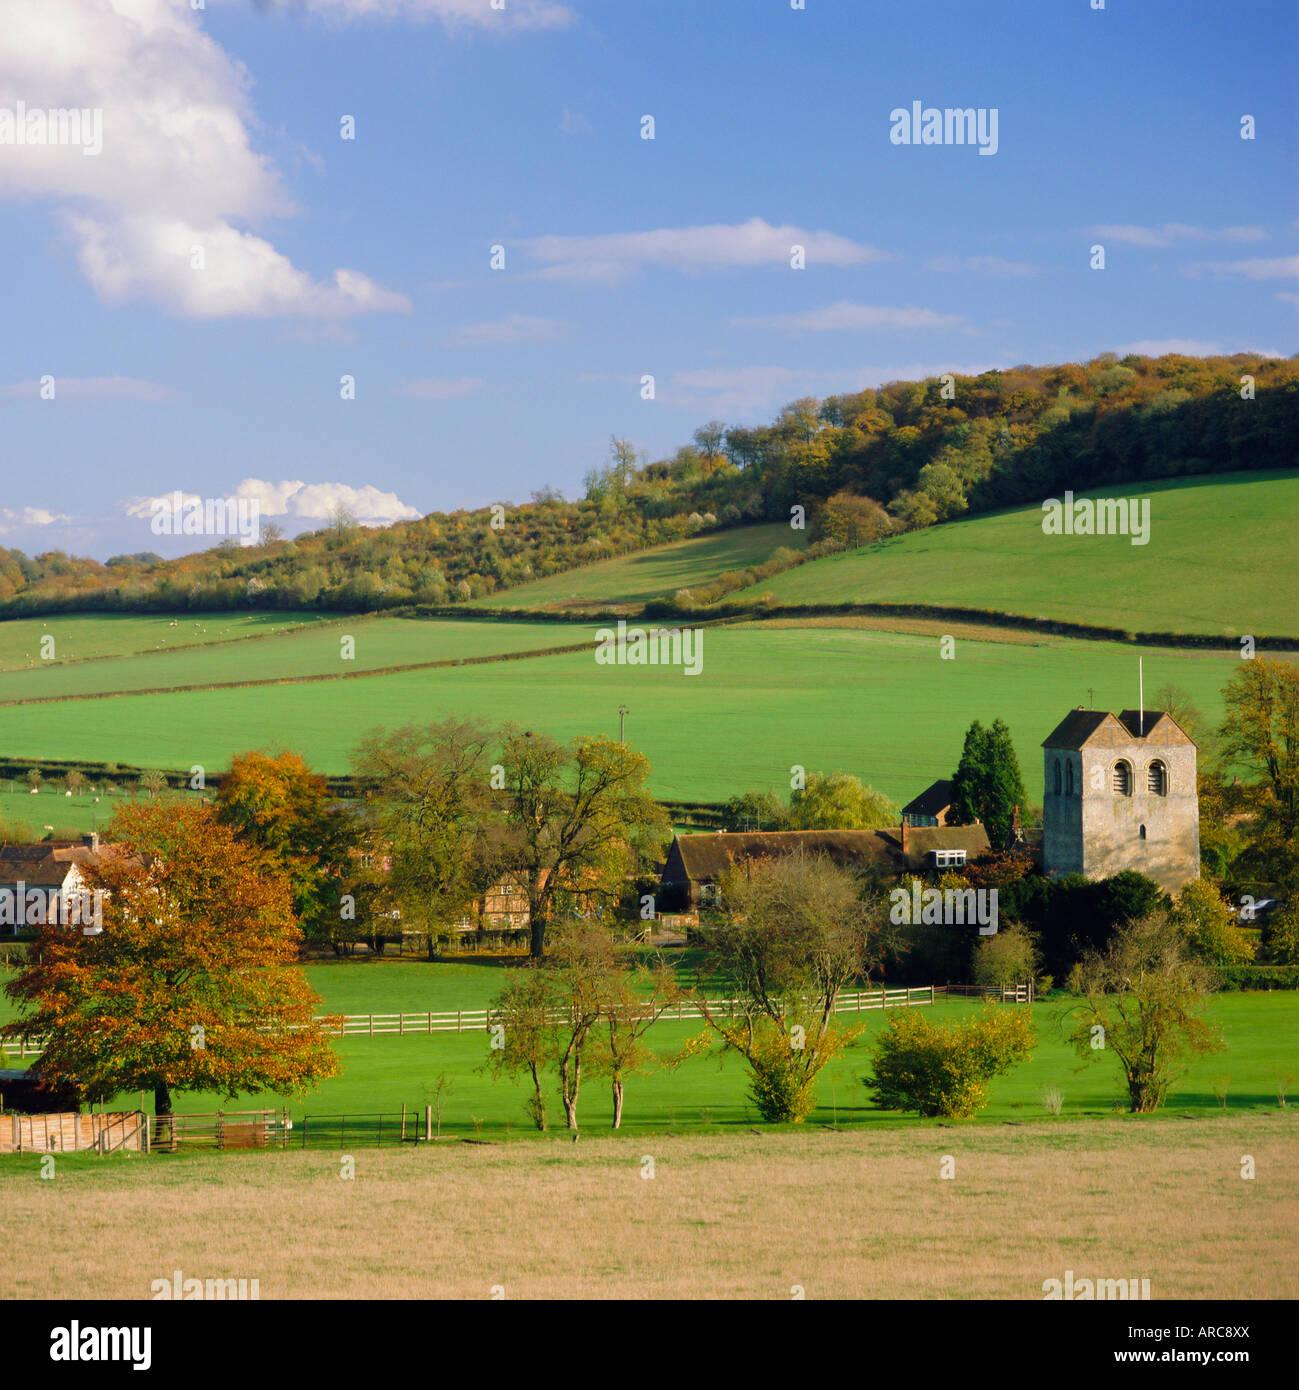 The village of Fingest, the Chilterns, Buckinghamshire, England, UK - Stock Image